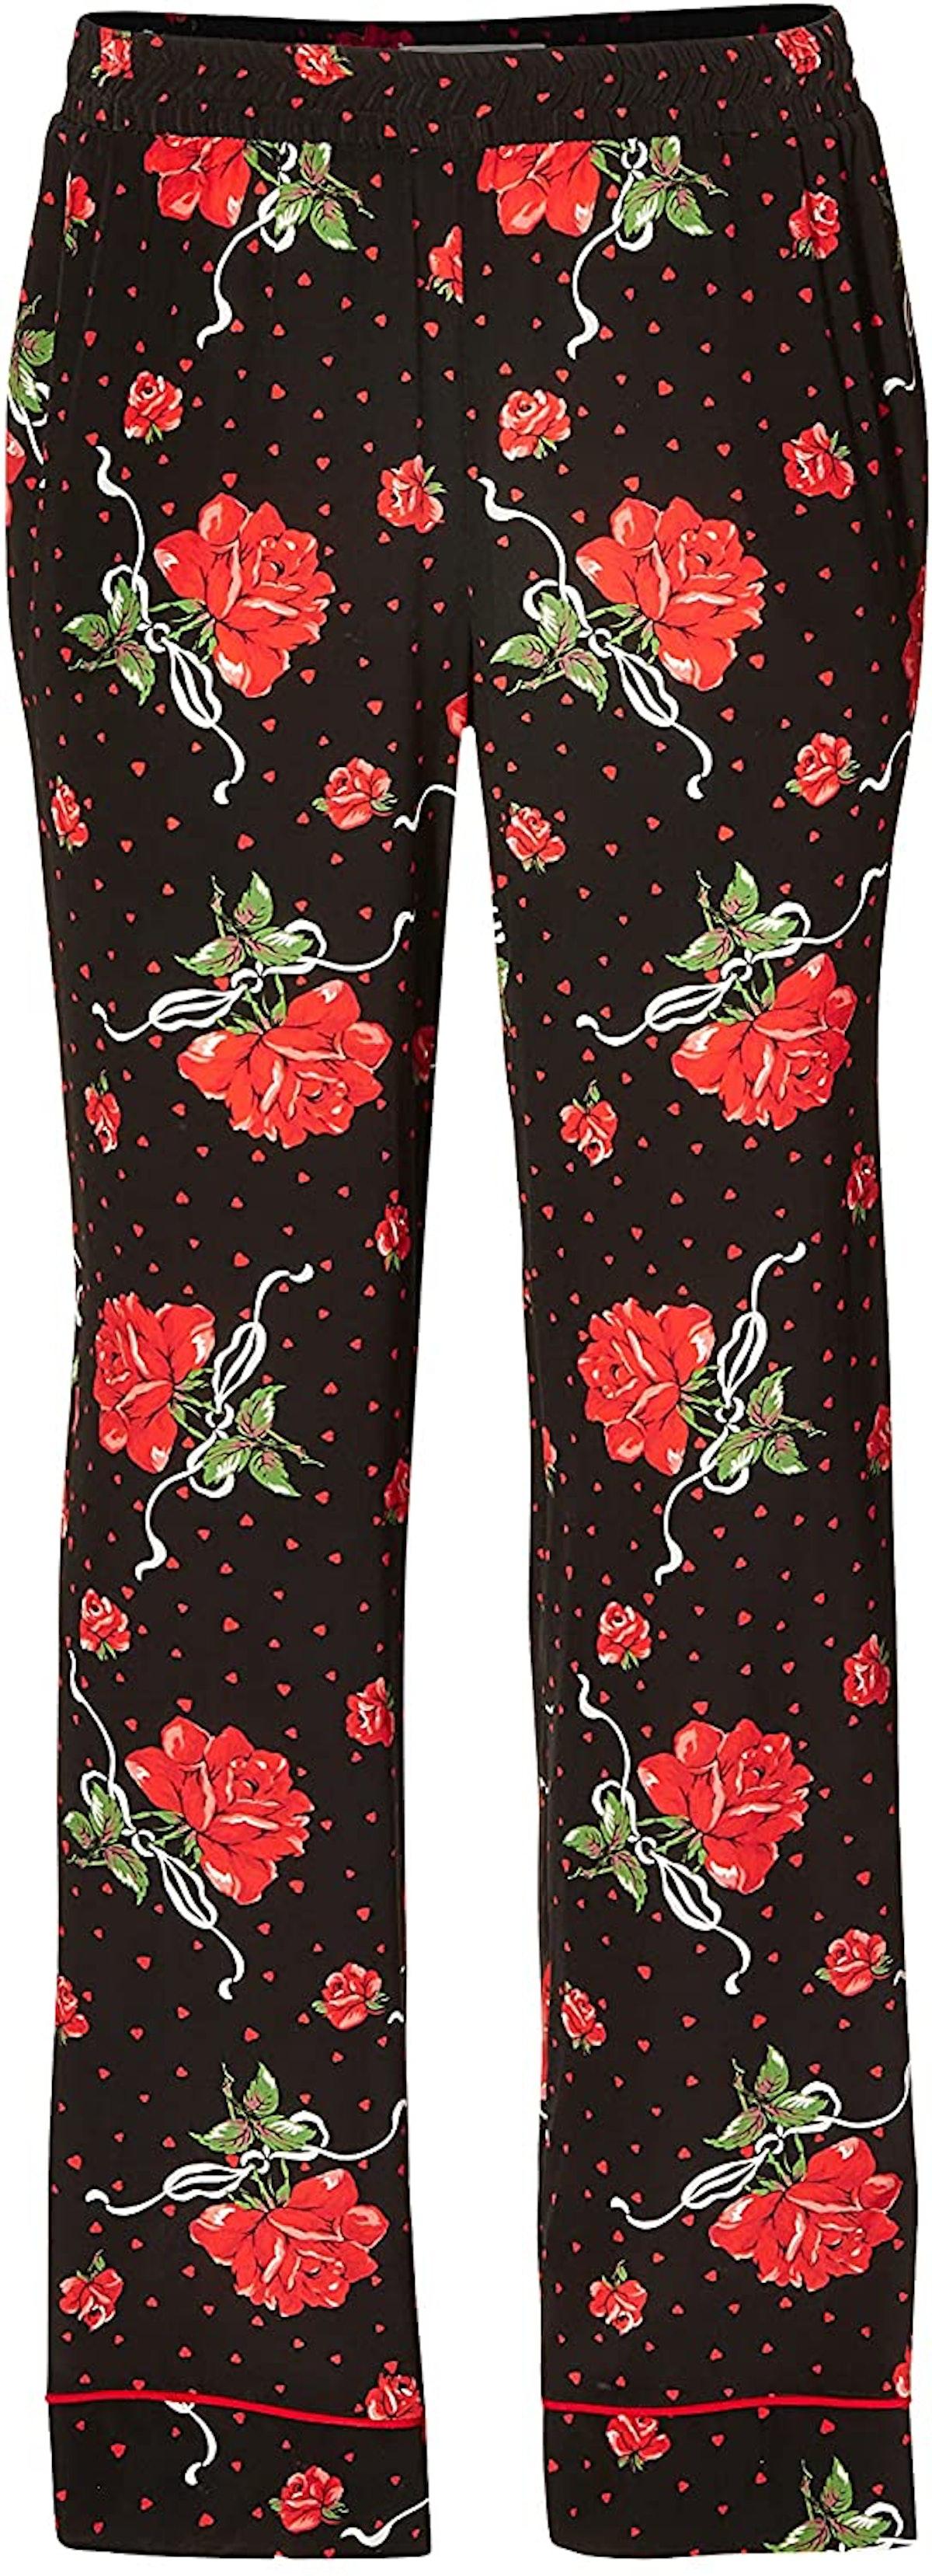 Red Rose Silk Pajama Pant